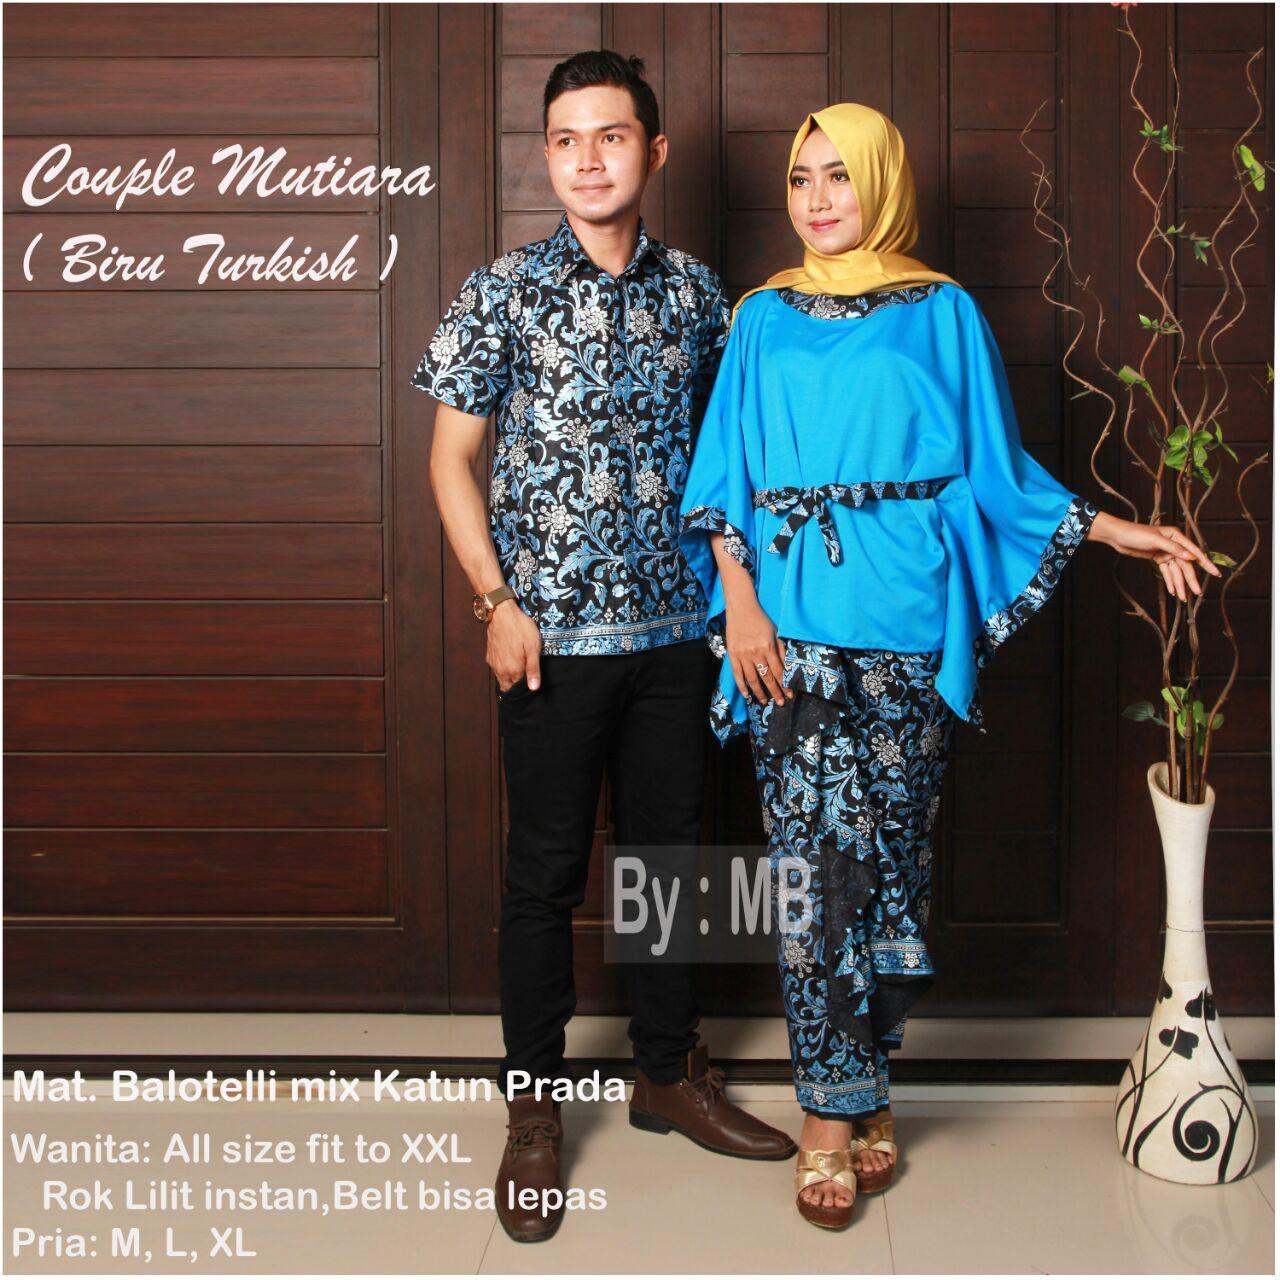 Batik Couple / Batik sarimbit / Batik / Batik keluarga / Batik Modern / Couple Batik rabbani